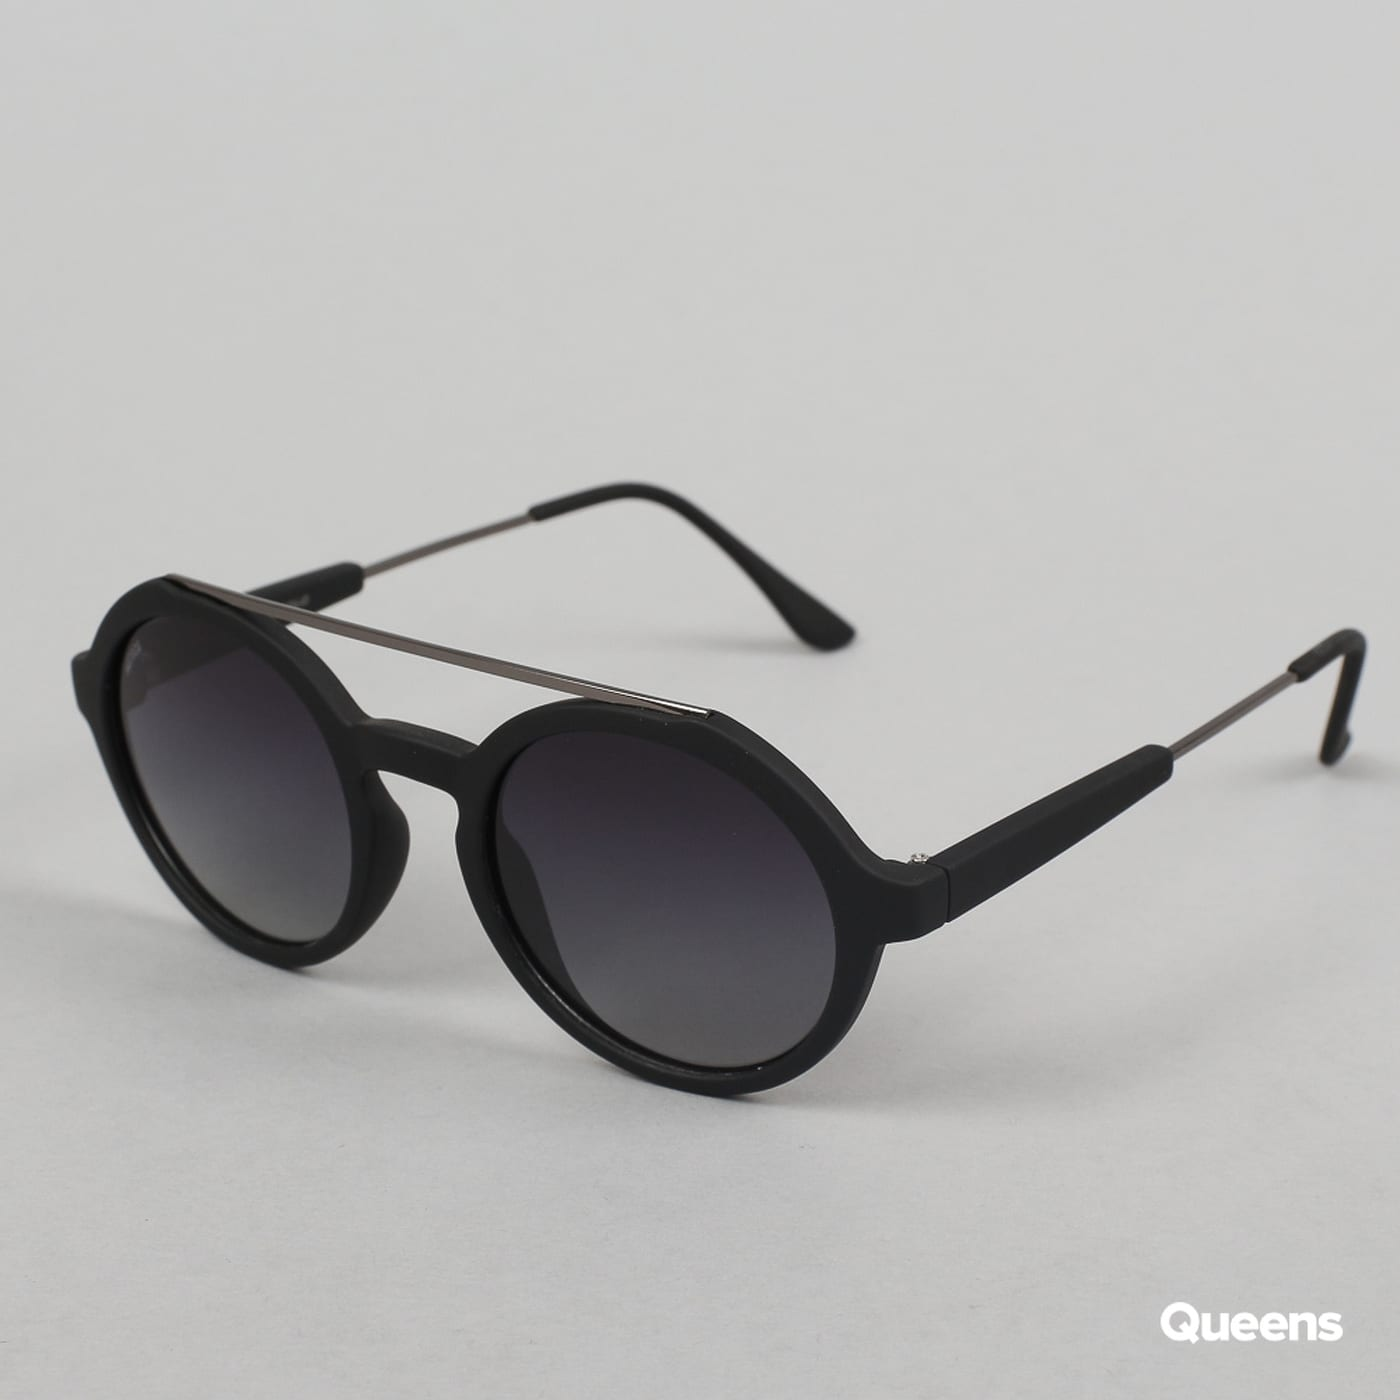 MD Sunglasses Retro Space schwarz / grau